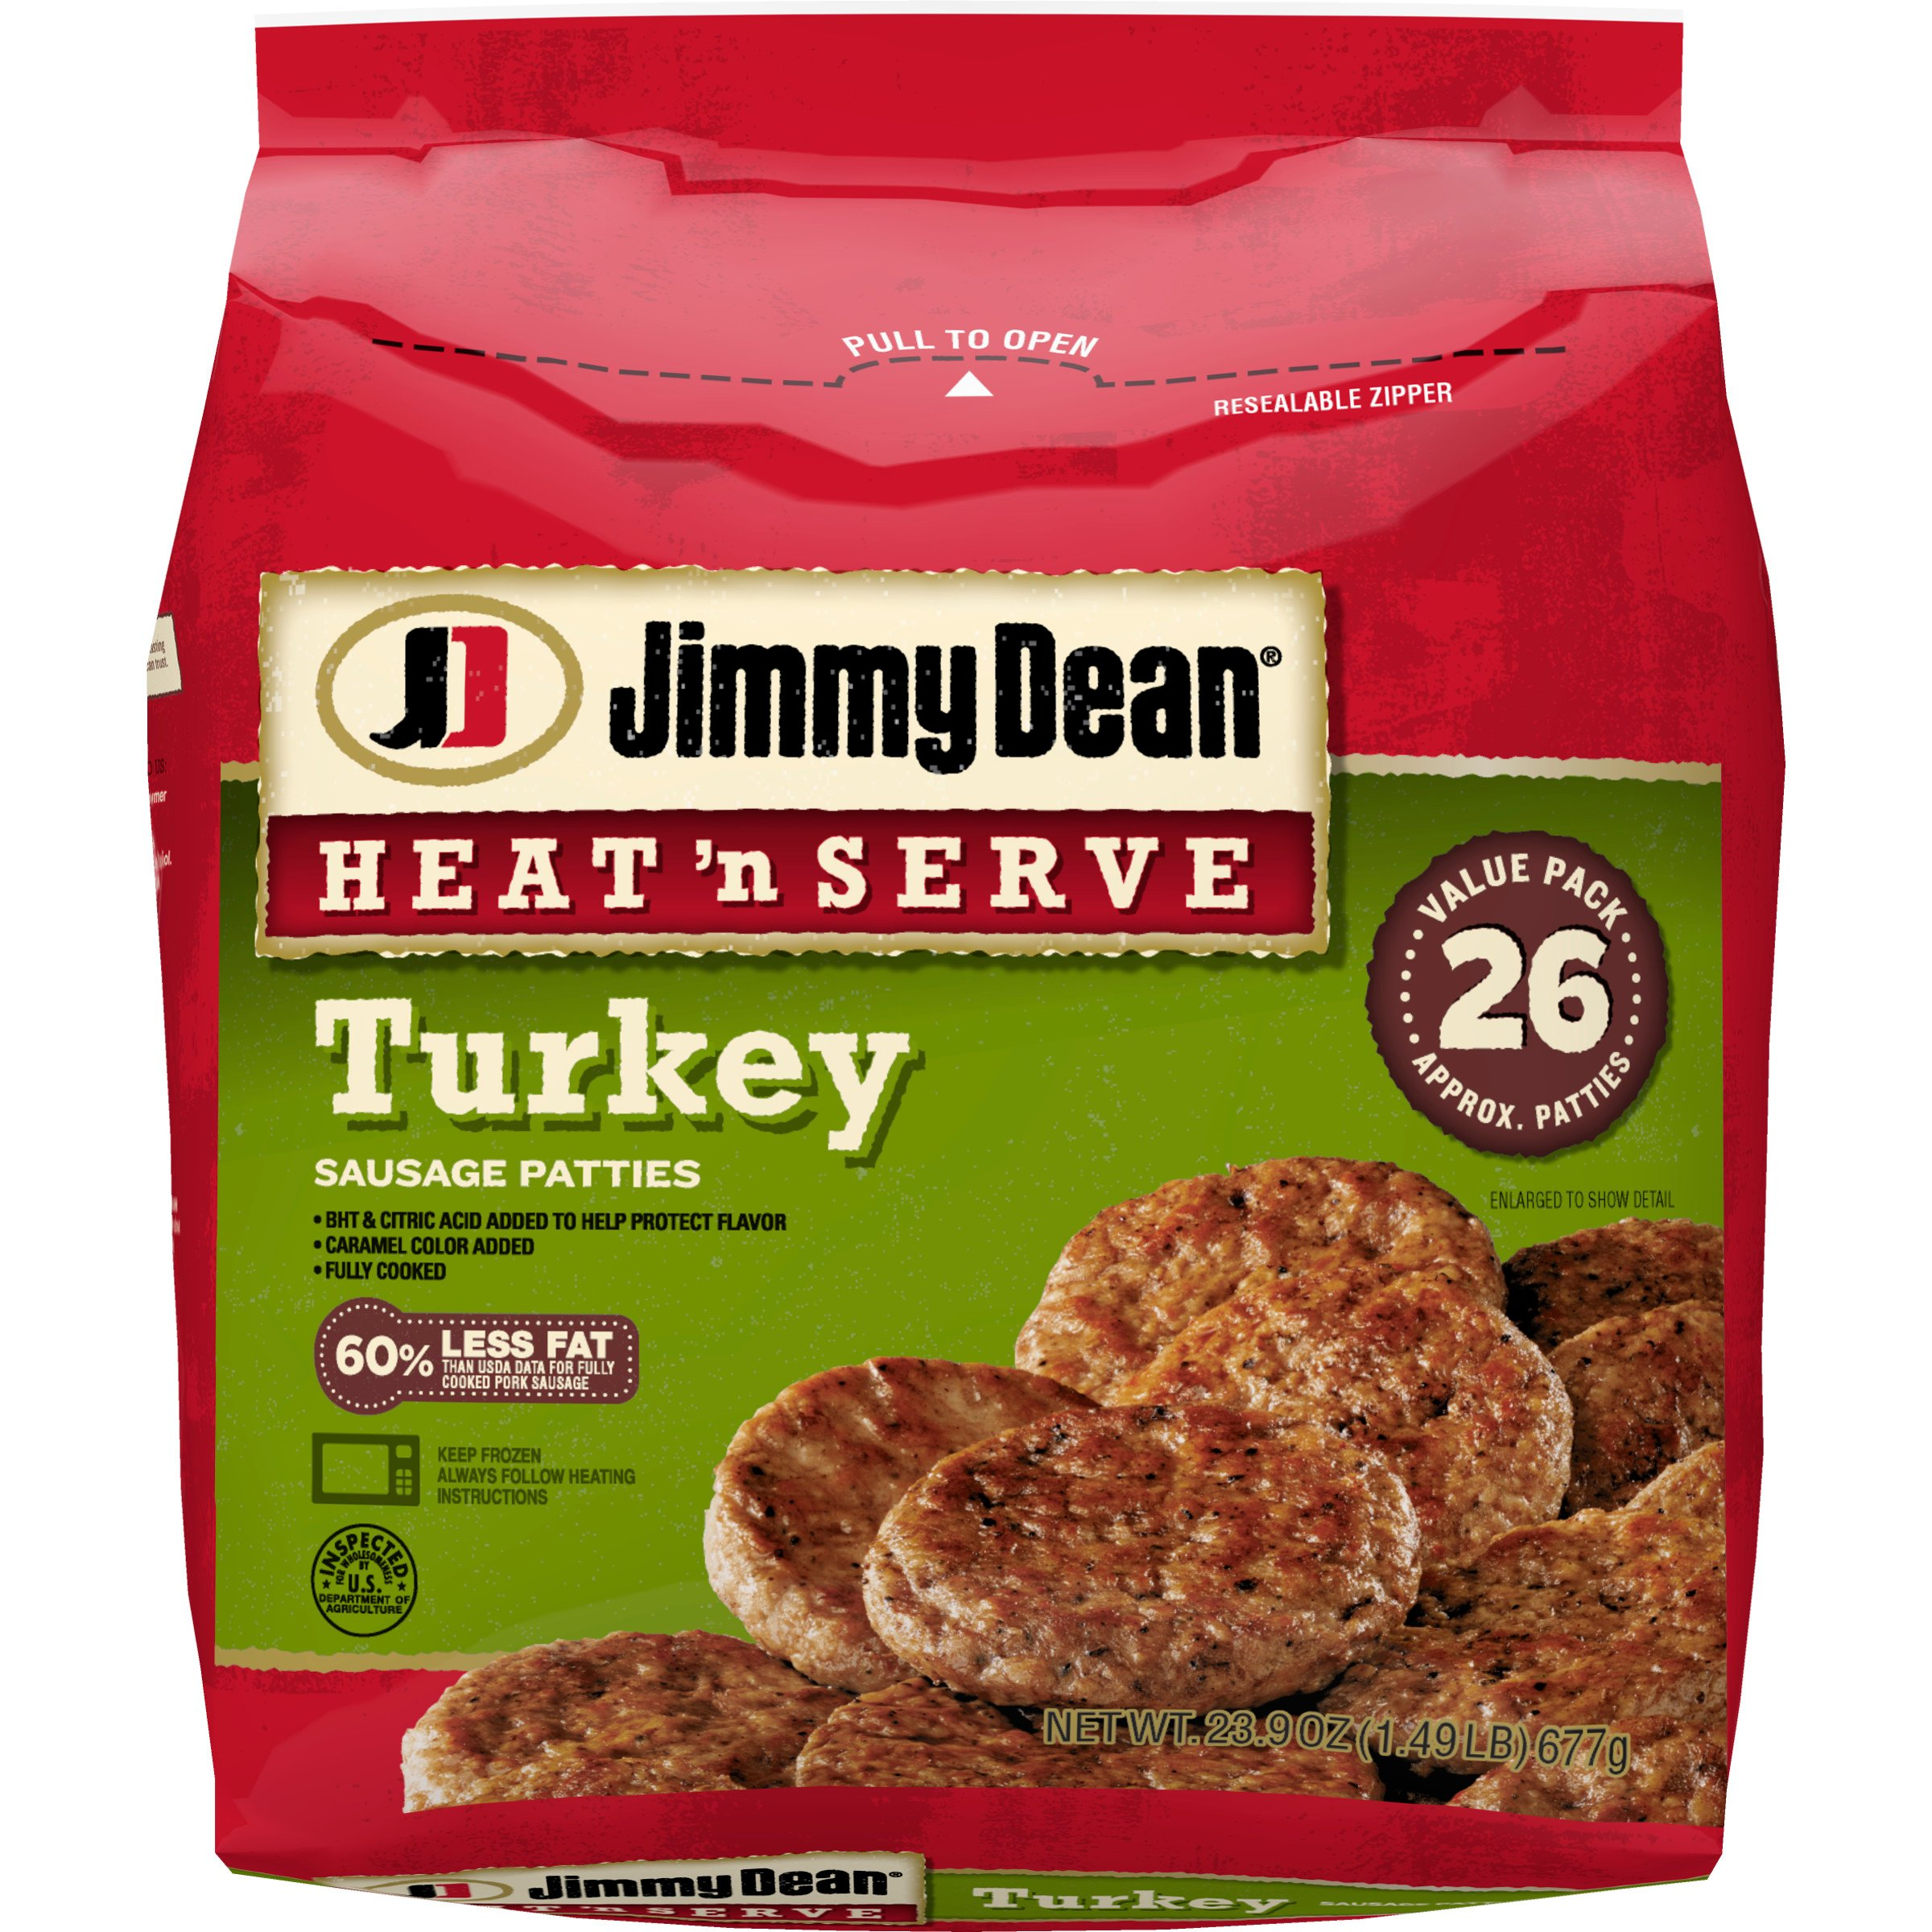 Jimmy Dean Heat 'N Serve Turkey Sausage